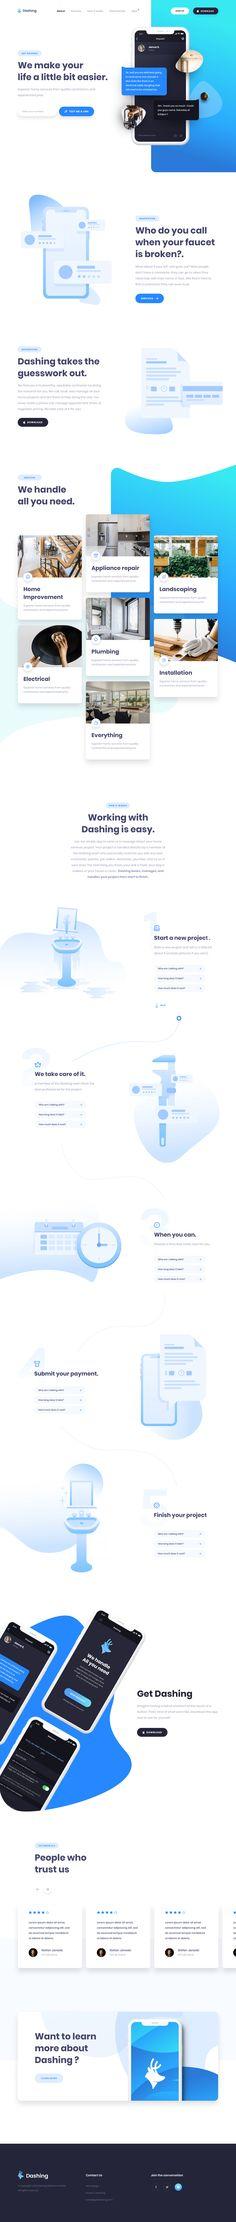 Dashing Web Design The post Dashing Web Design appeared first on Design. Cool Web Design, Web Design Studio, Ui Ux Design, Layout Design, Best Landing Pages, App Landing Page, Landing Page Design, Simple Website Templates, Queen Makeup